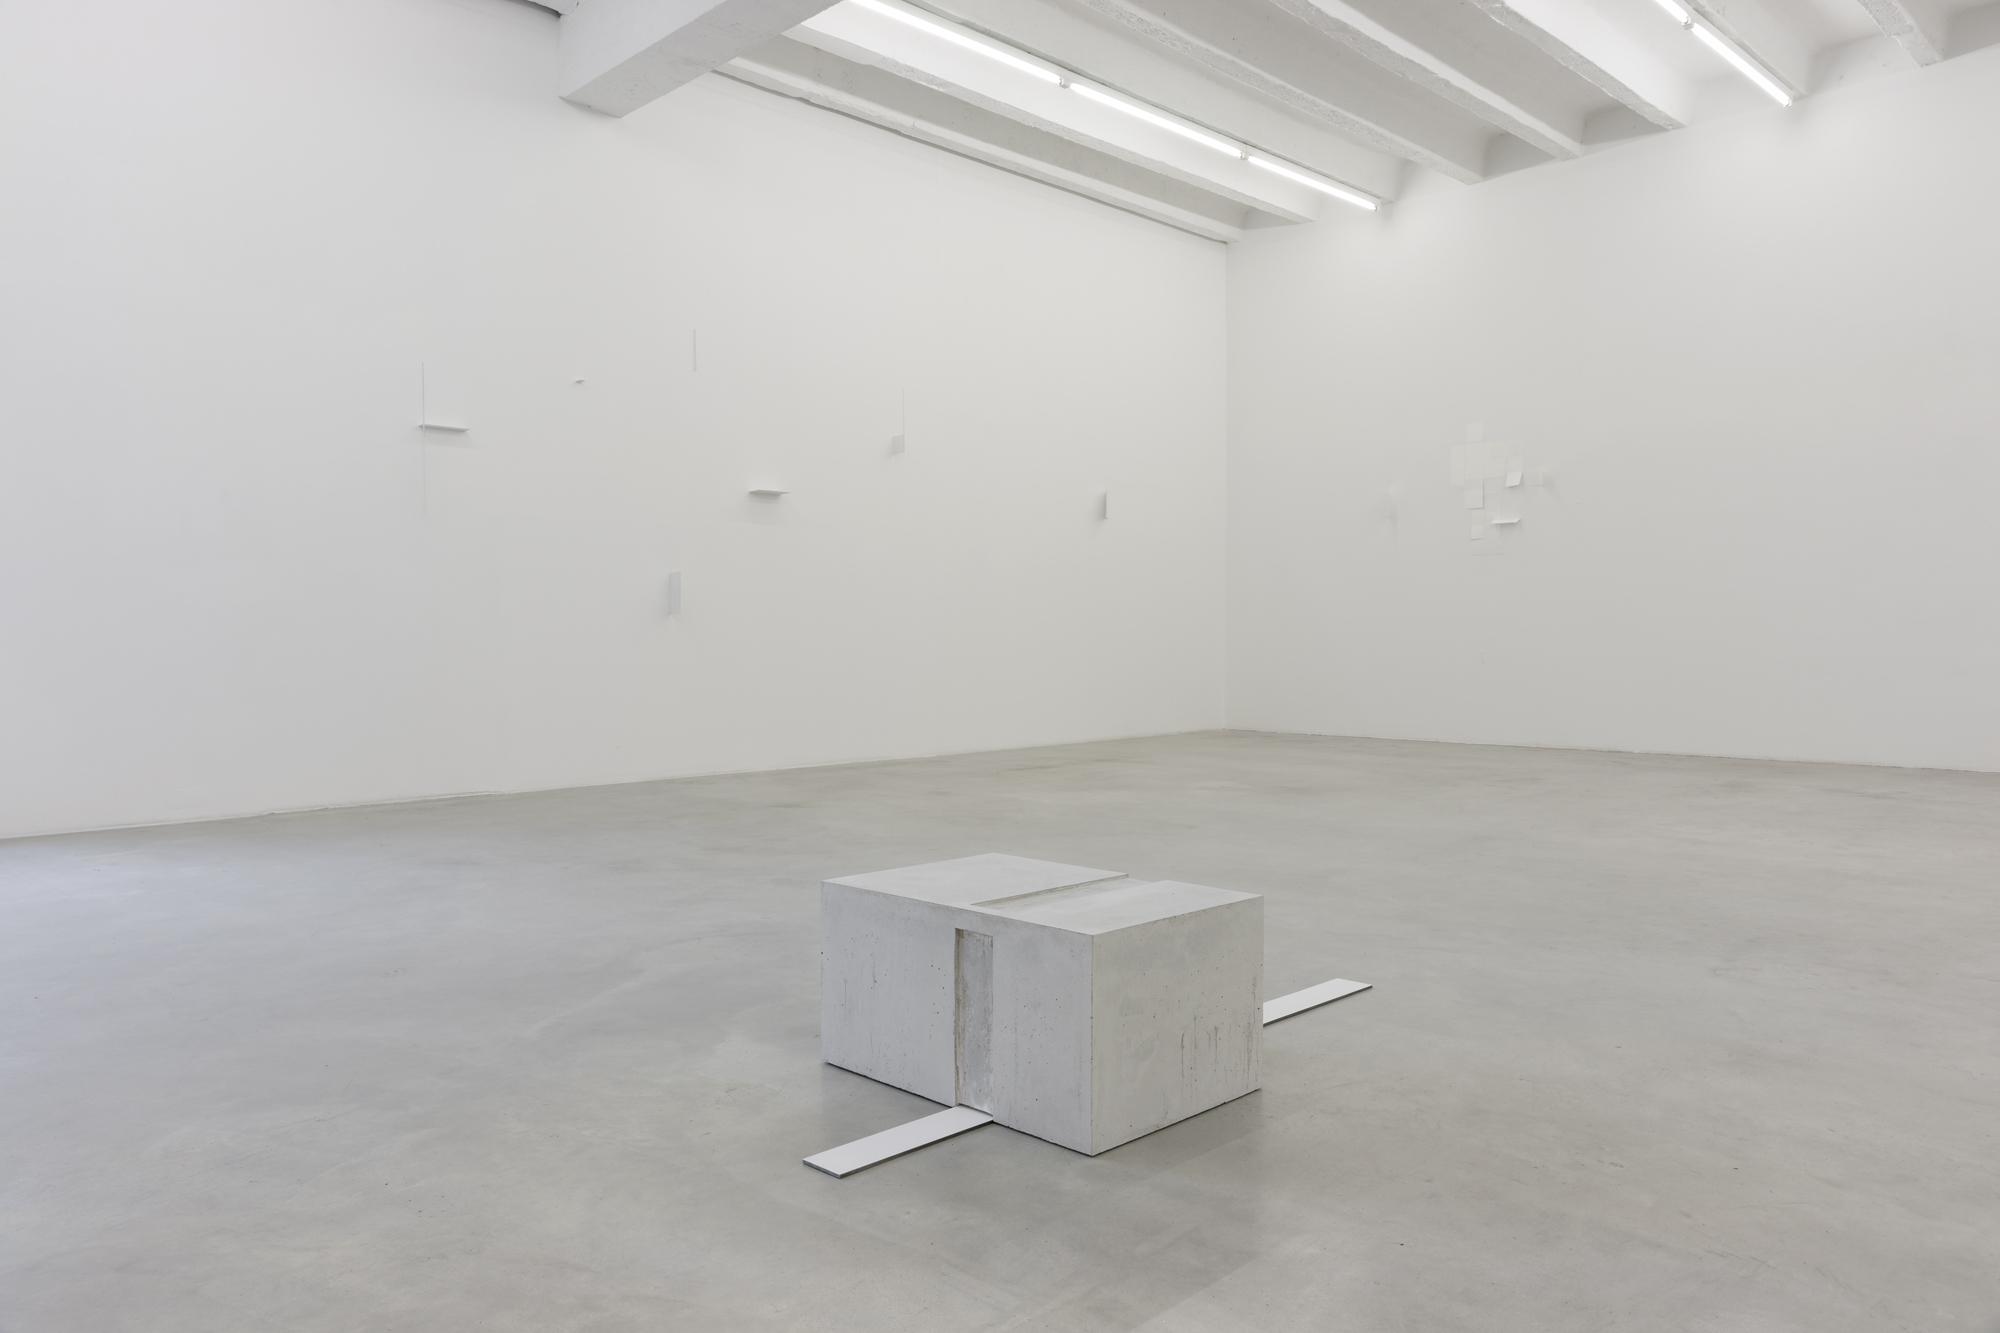 Marcius Galan, Fernanda Gomes, Goran Petercol: Site, Specific, Objects, exhibition view, Galerija Gregor Podnar, Berlin, 2015. Photo: Marcus Schneider